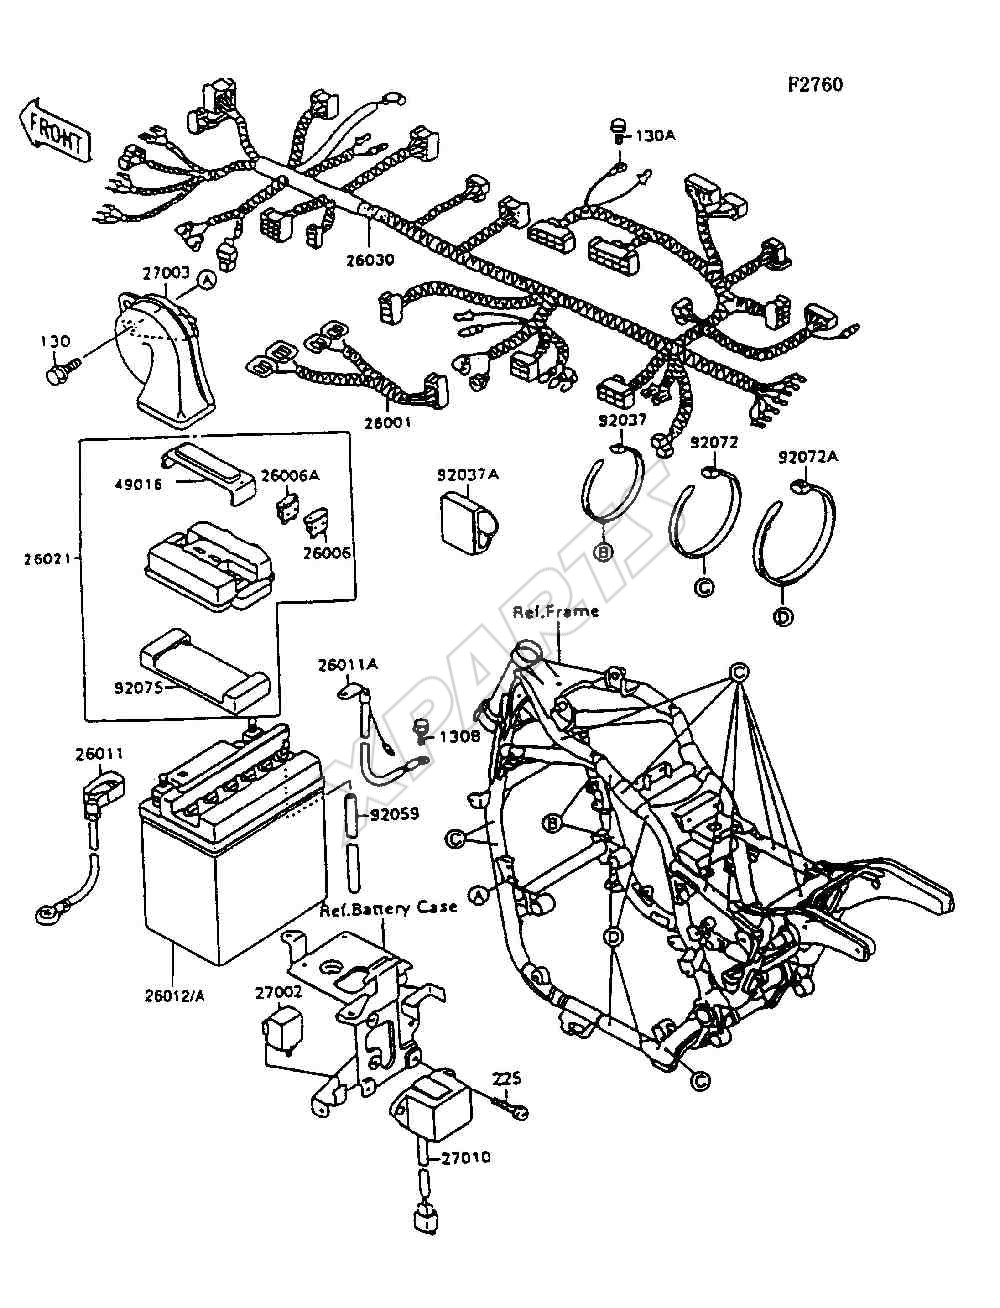 hight resolution of 1997 kawasaki vulcan 1500 wiring diagram schematics and wiring kawasaki vulcan 1500 classic review 1997 vulcan